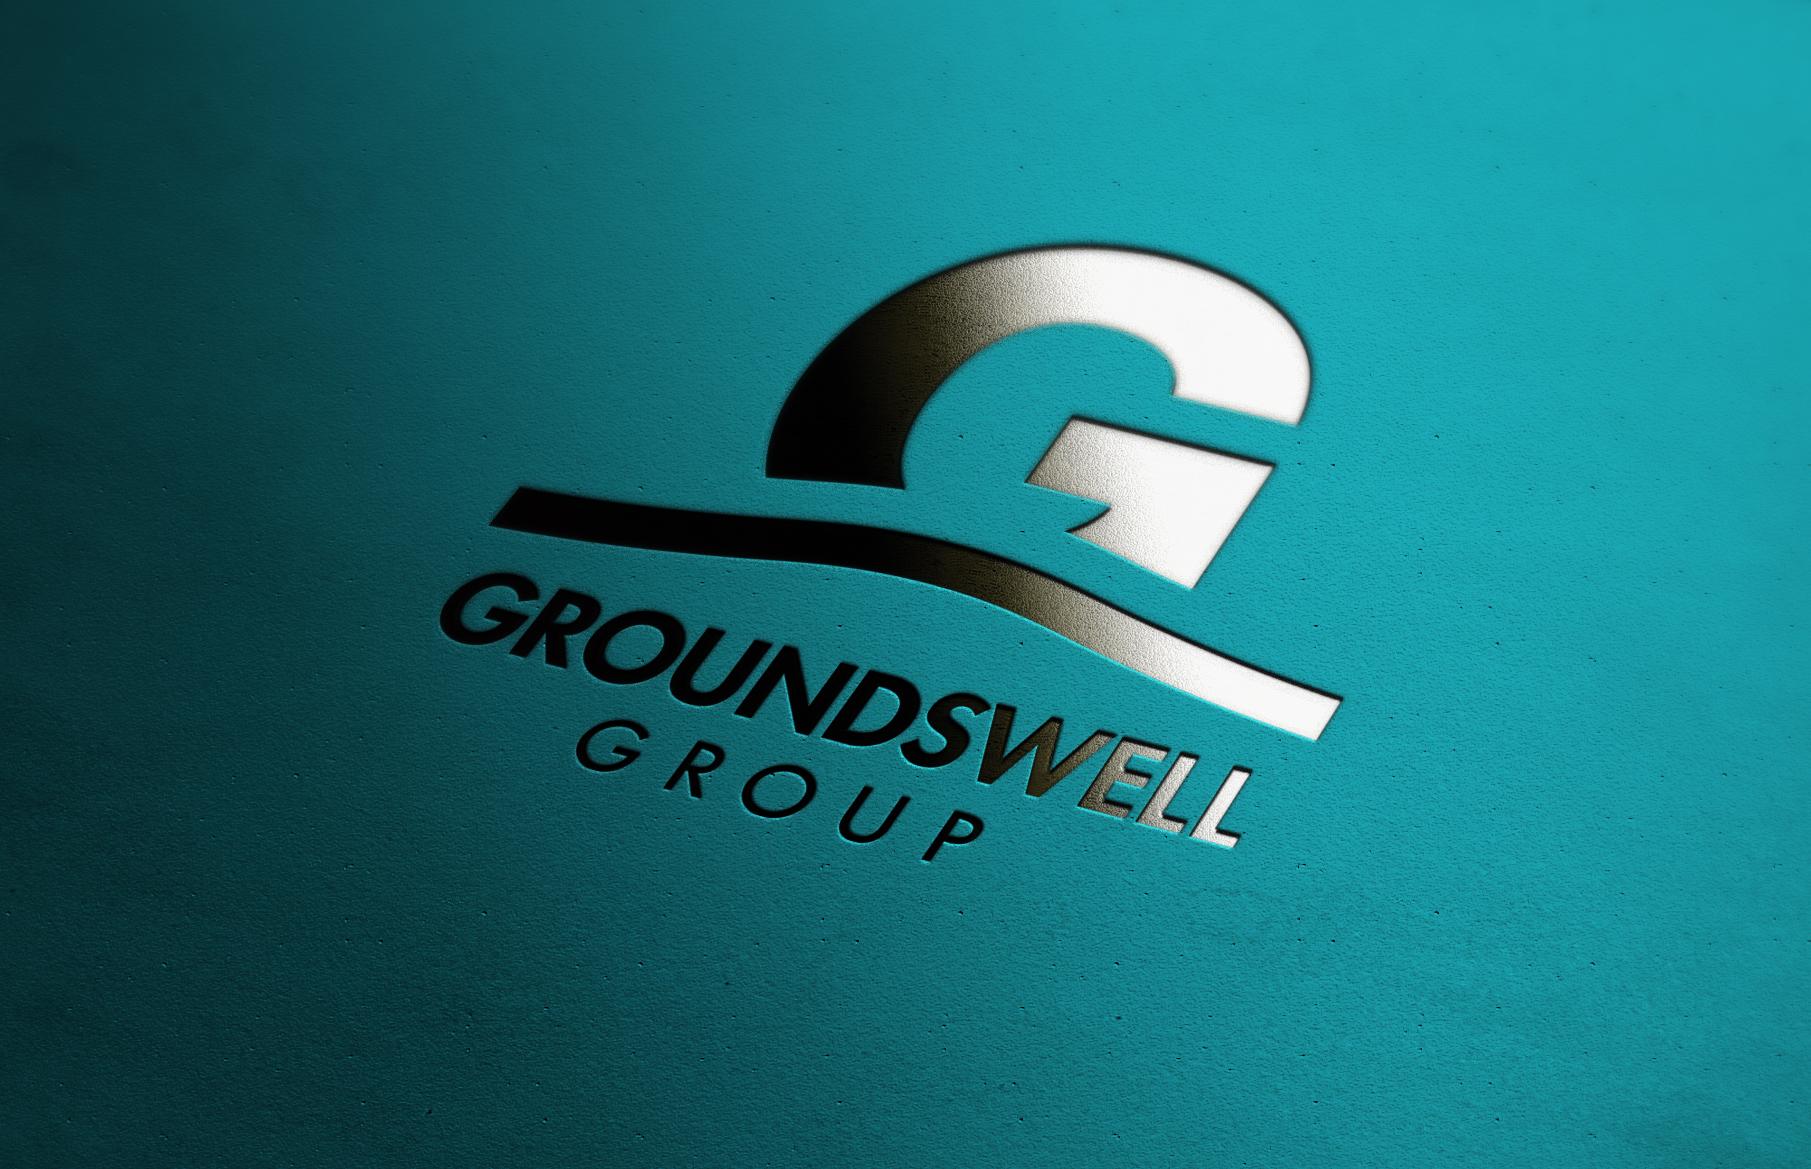 Groundswell-Logo-MockUp.jpg